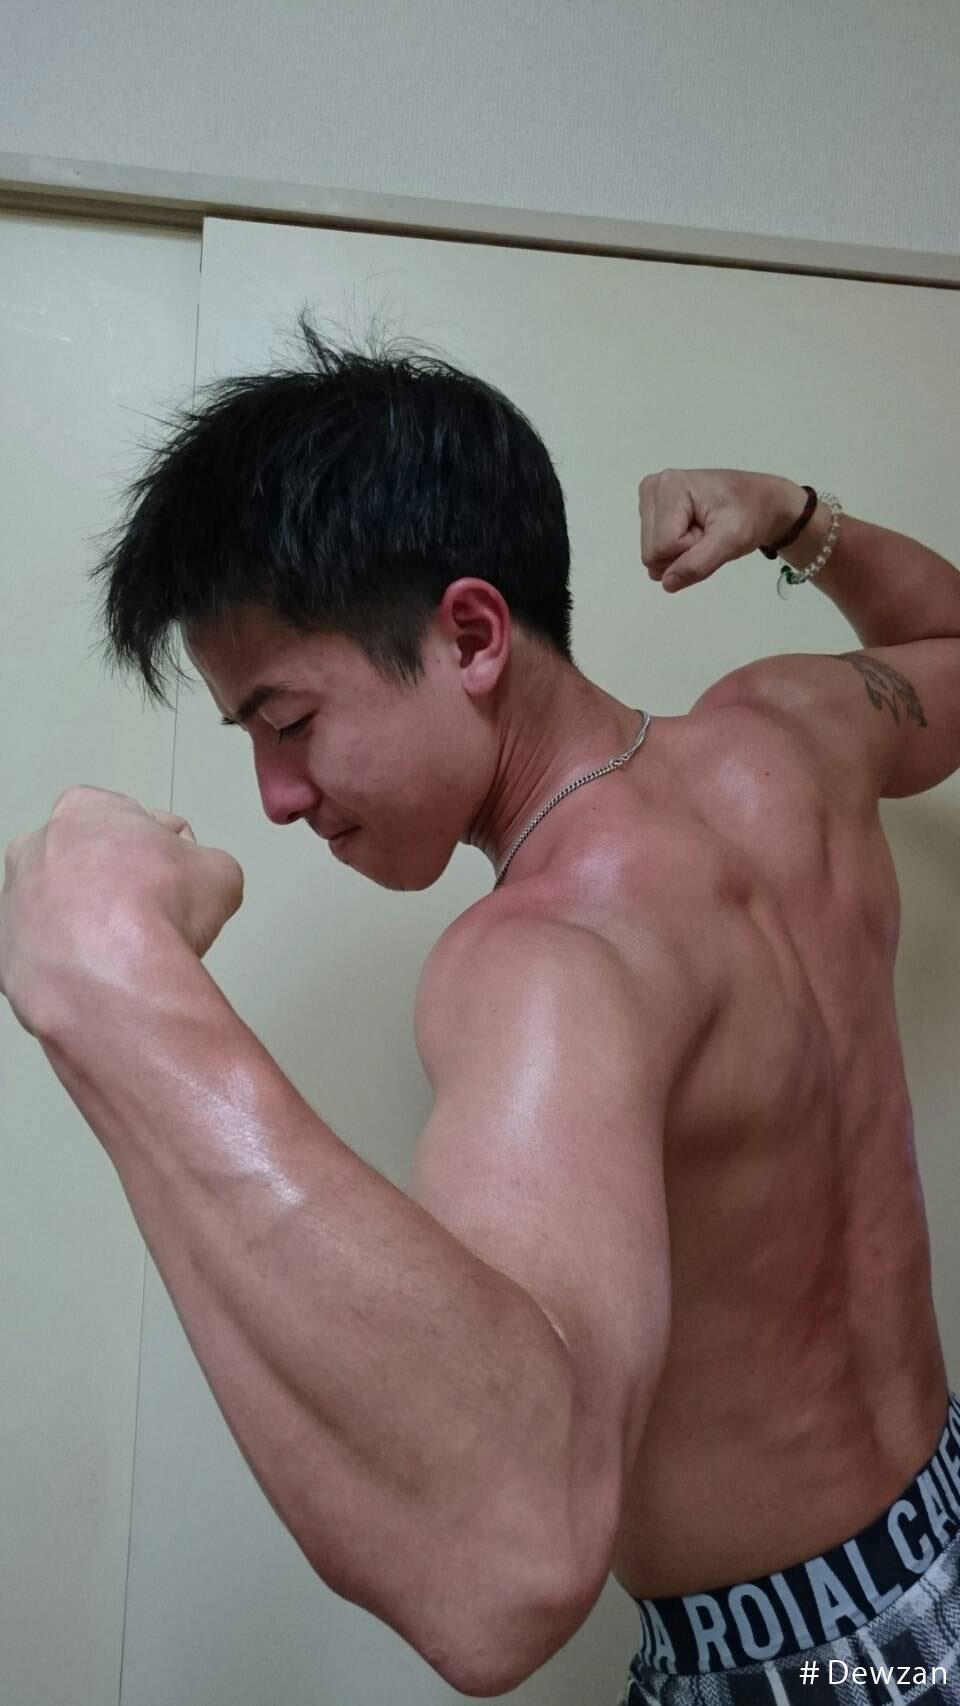 2goo,ダンサー,筋肉,筋トレ